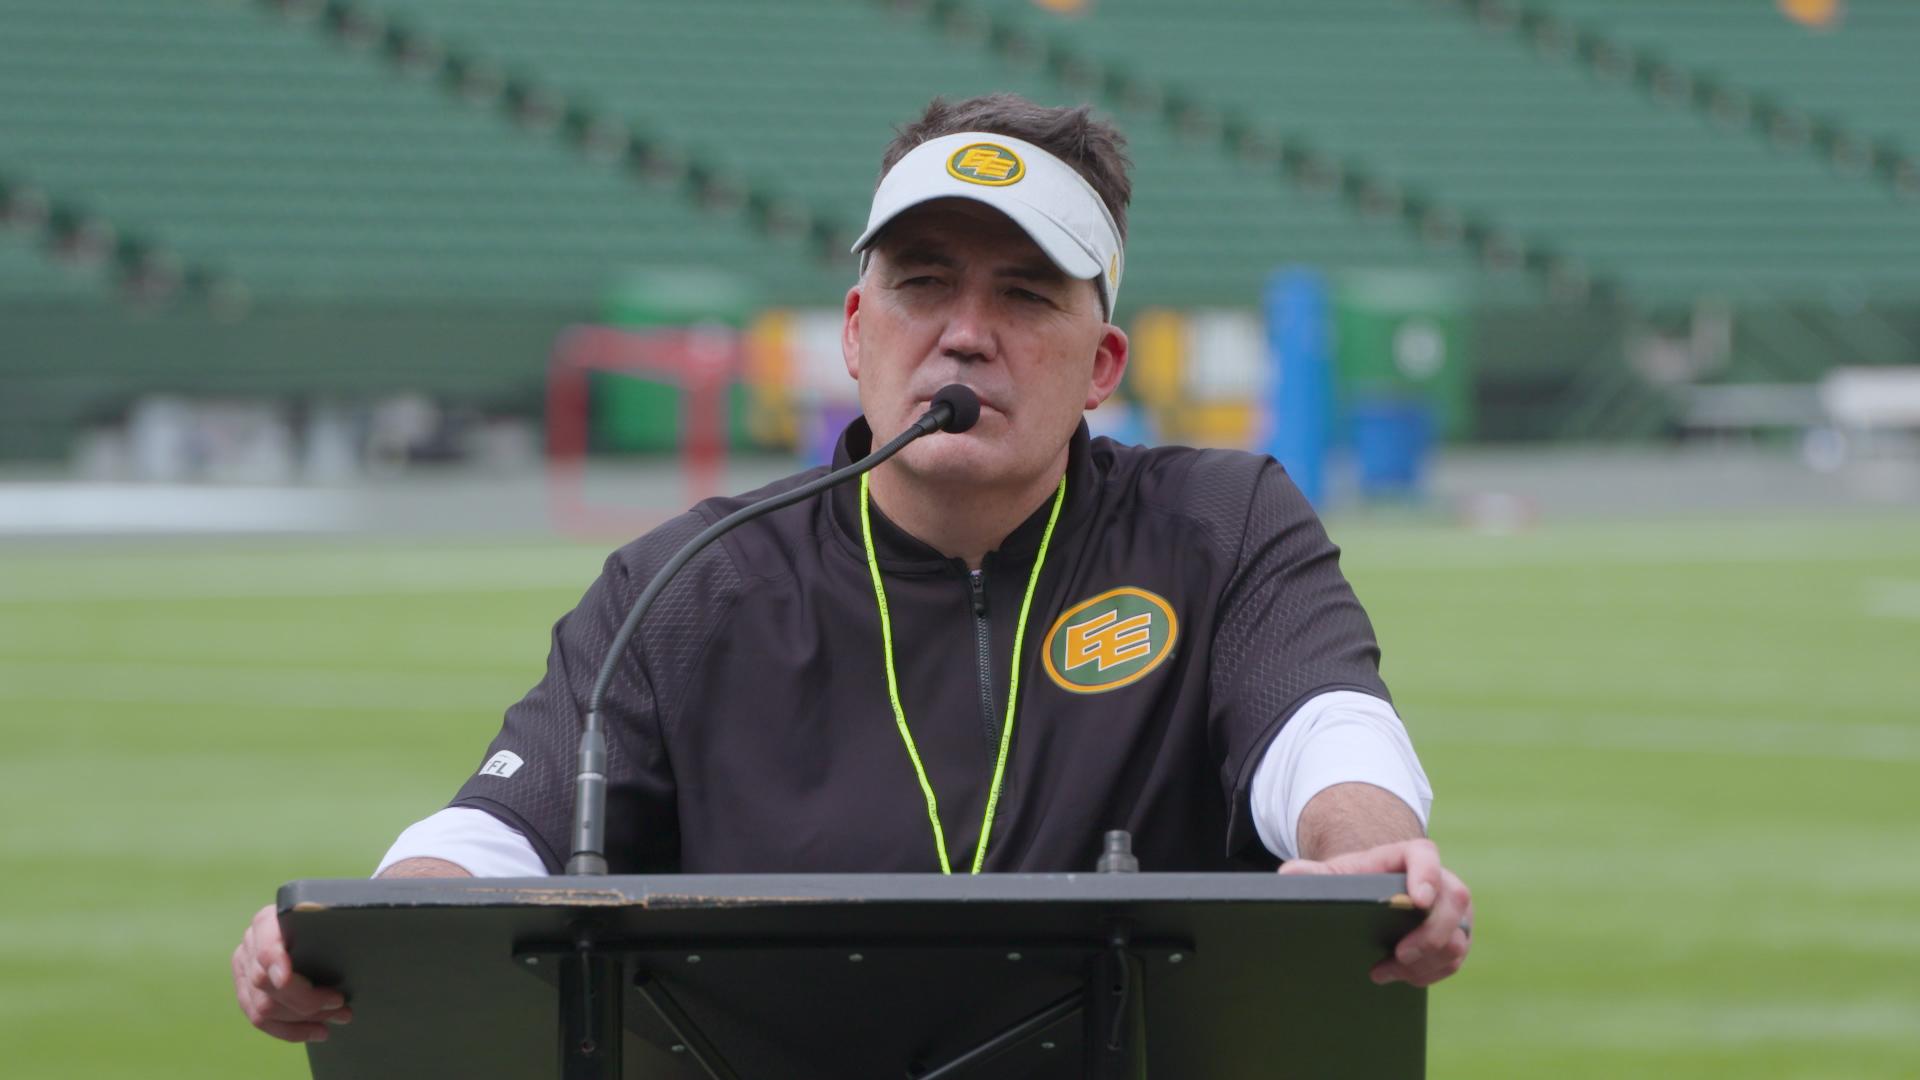 Post Practice: Head Coach Jaime Elizondo